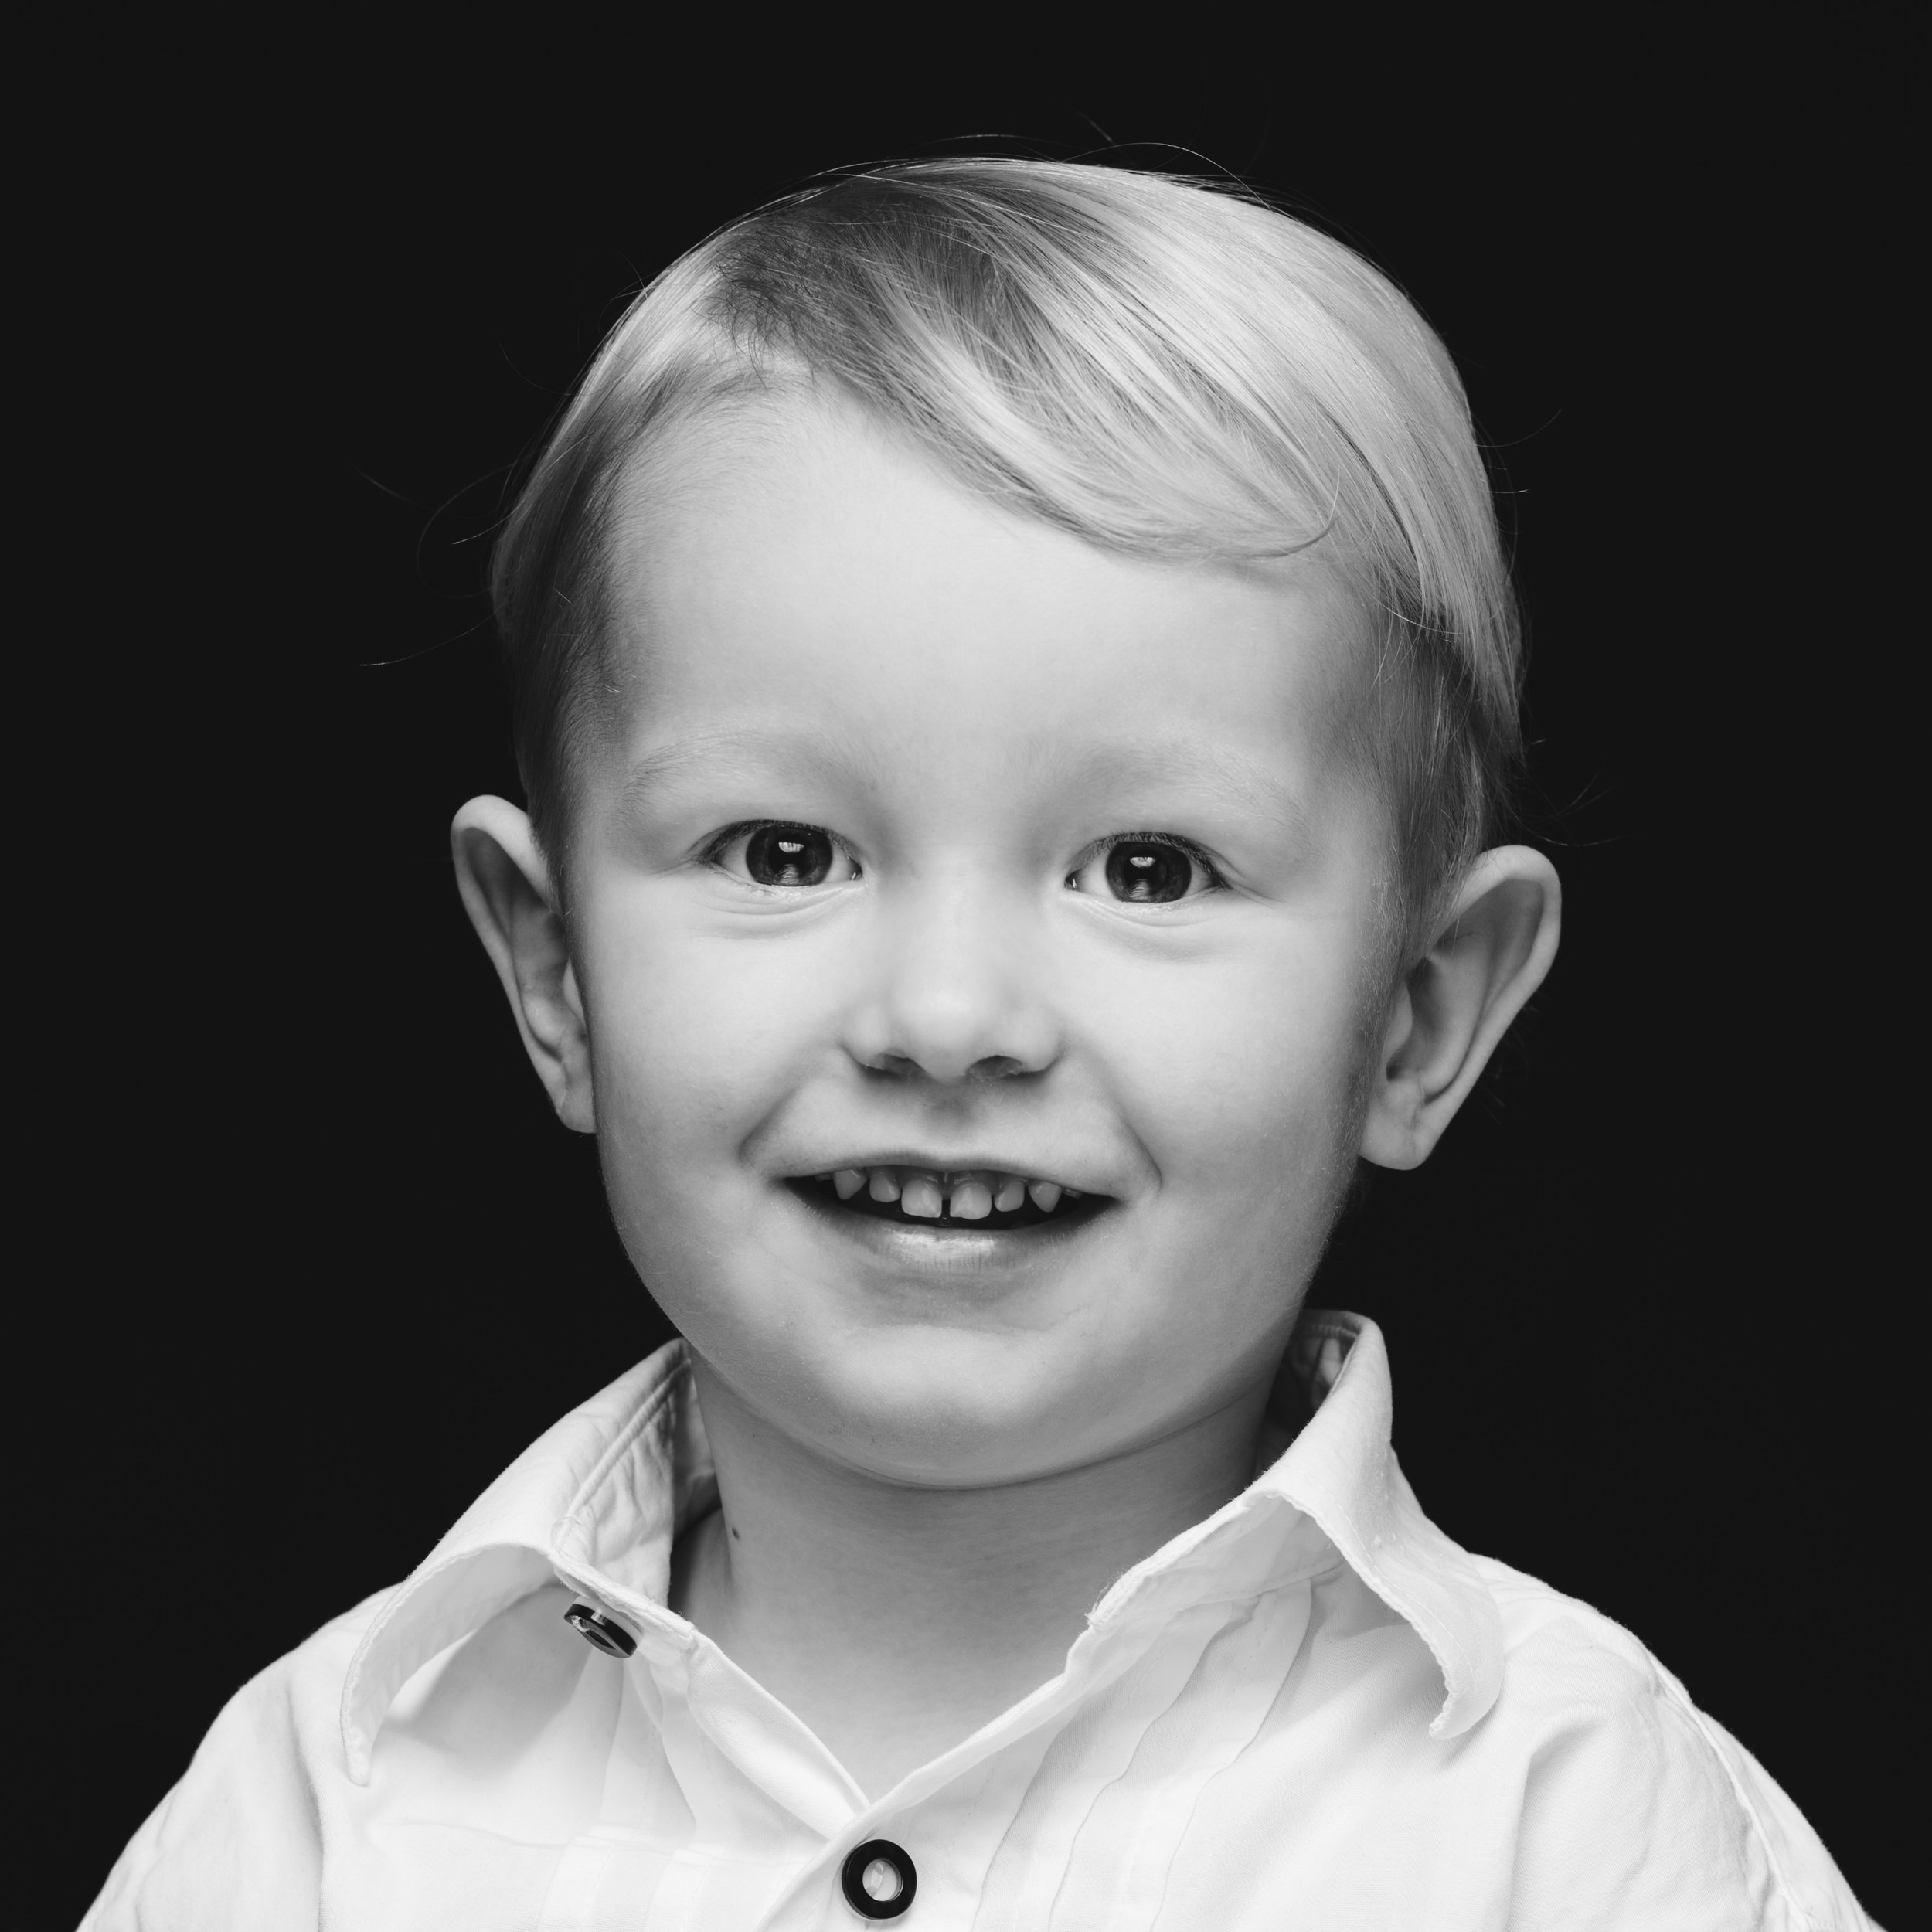 Familienportrait Schwarz Weiss